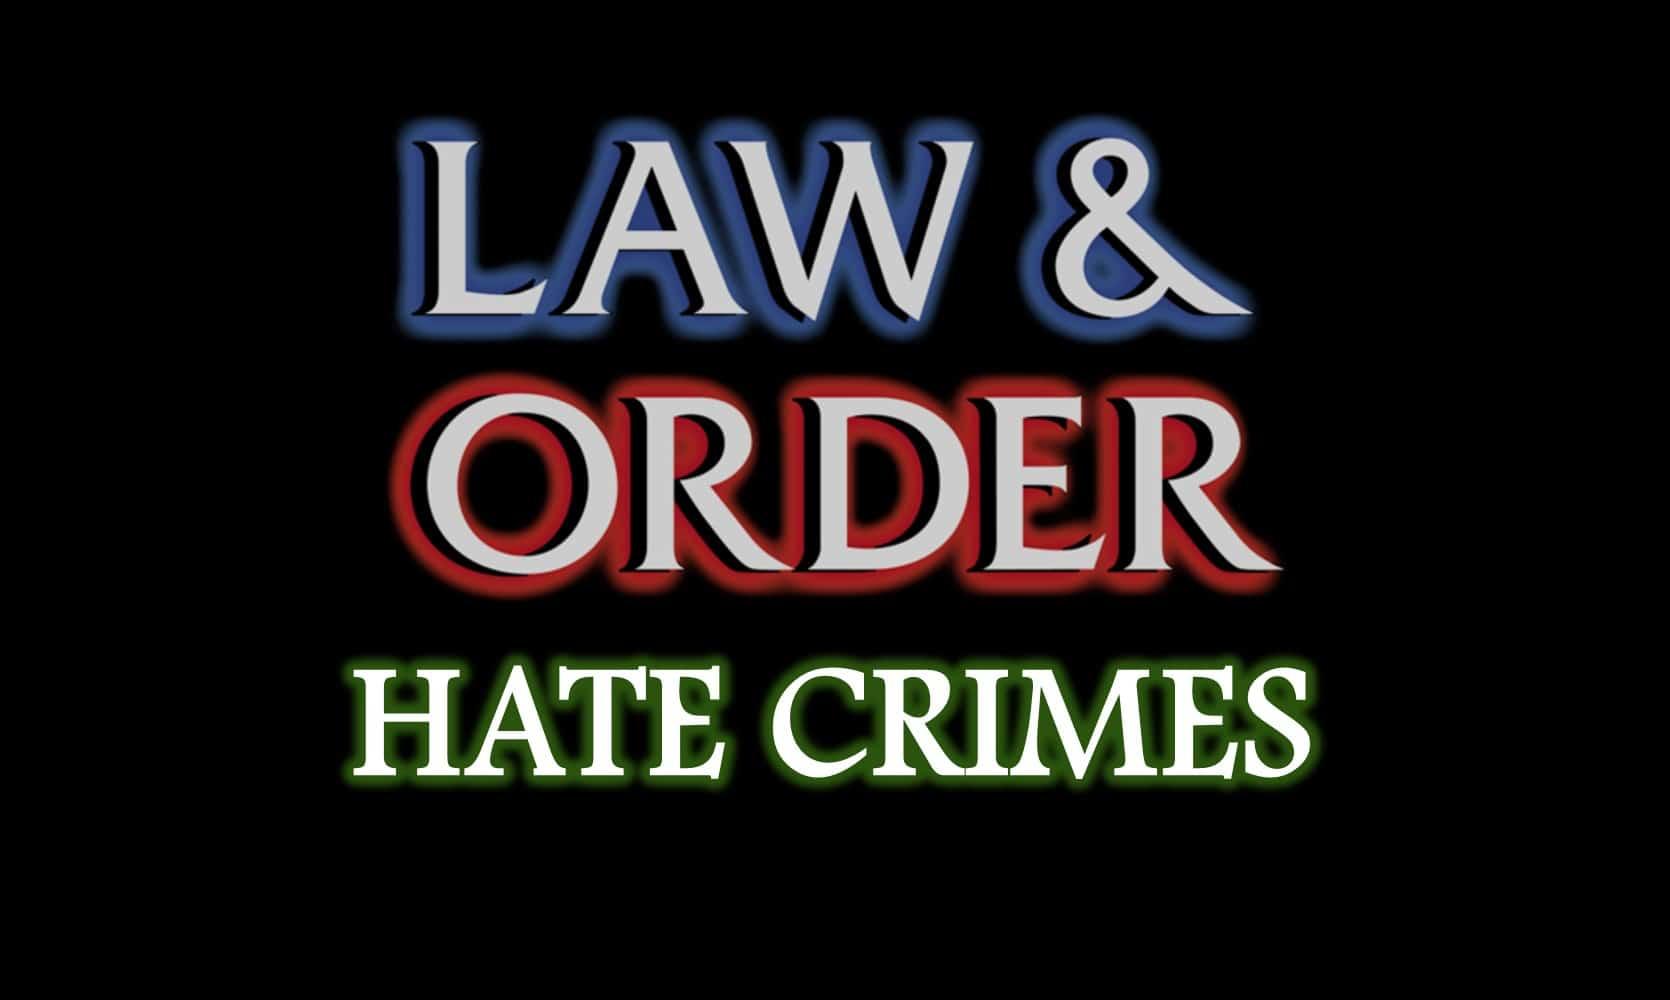 Law Amp Order Hate Crimes Gets 13 Episode Order Amp Becomes 12th Law Amp Order Franchise Tv Show To